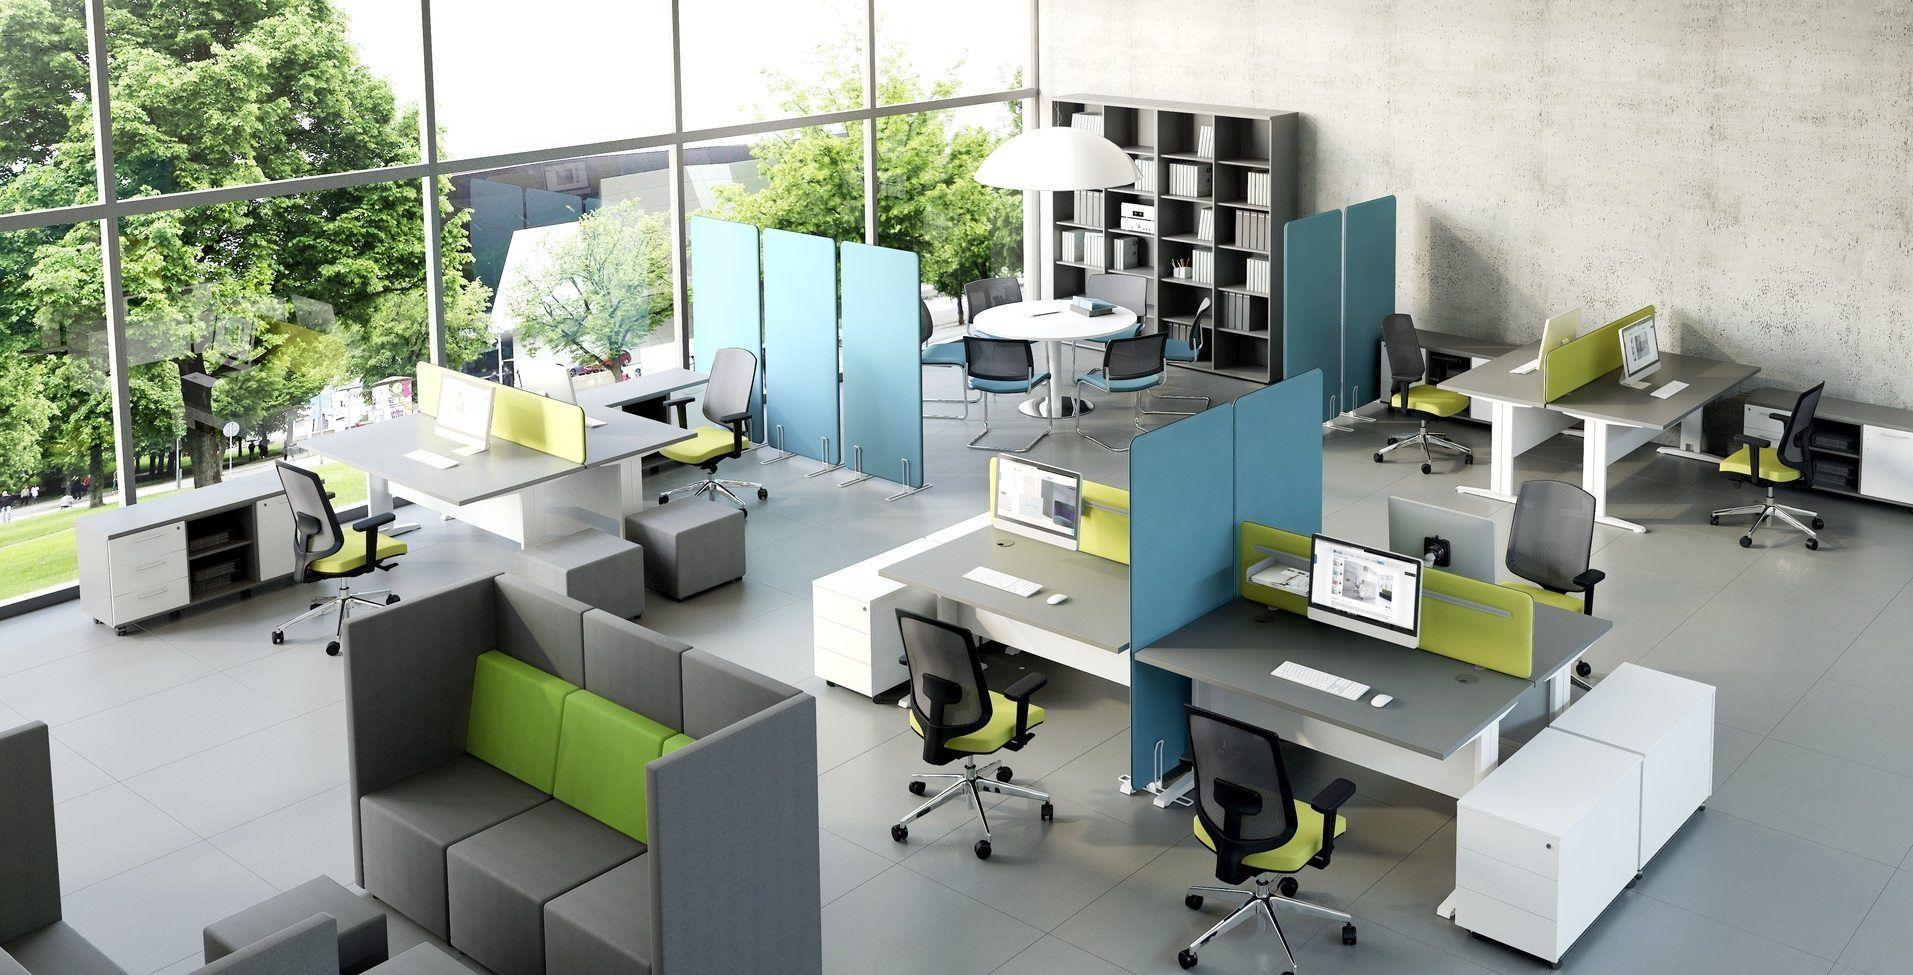 Image result for modern open office design | Office - 2019